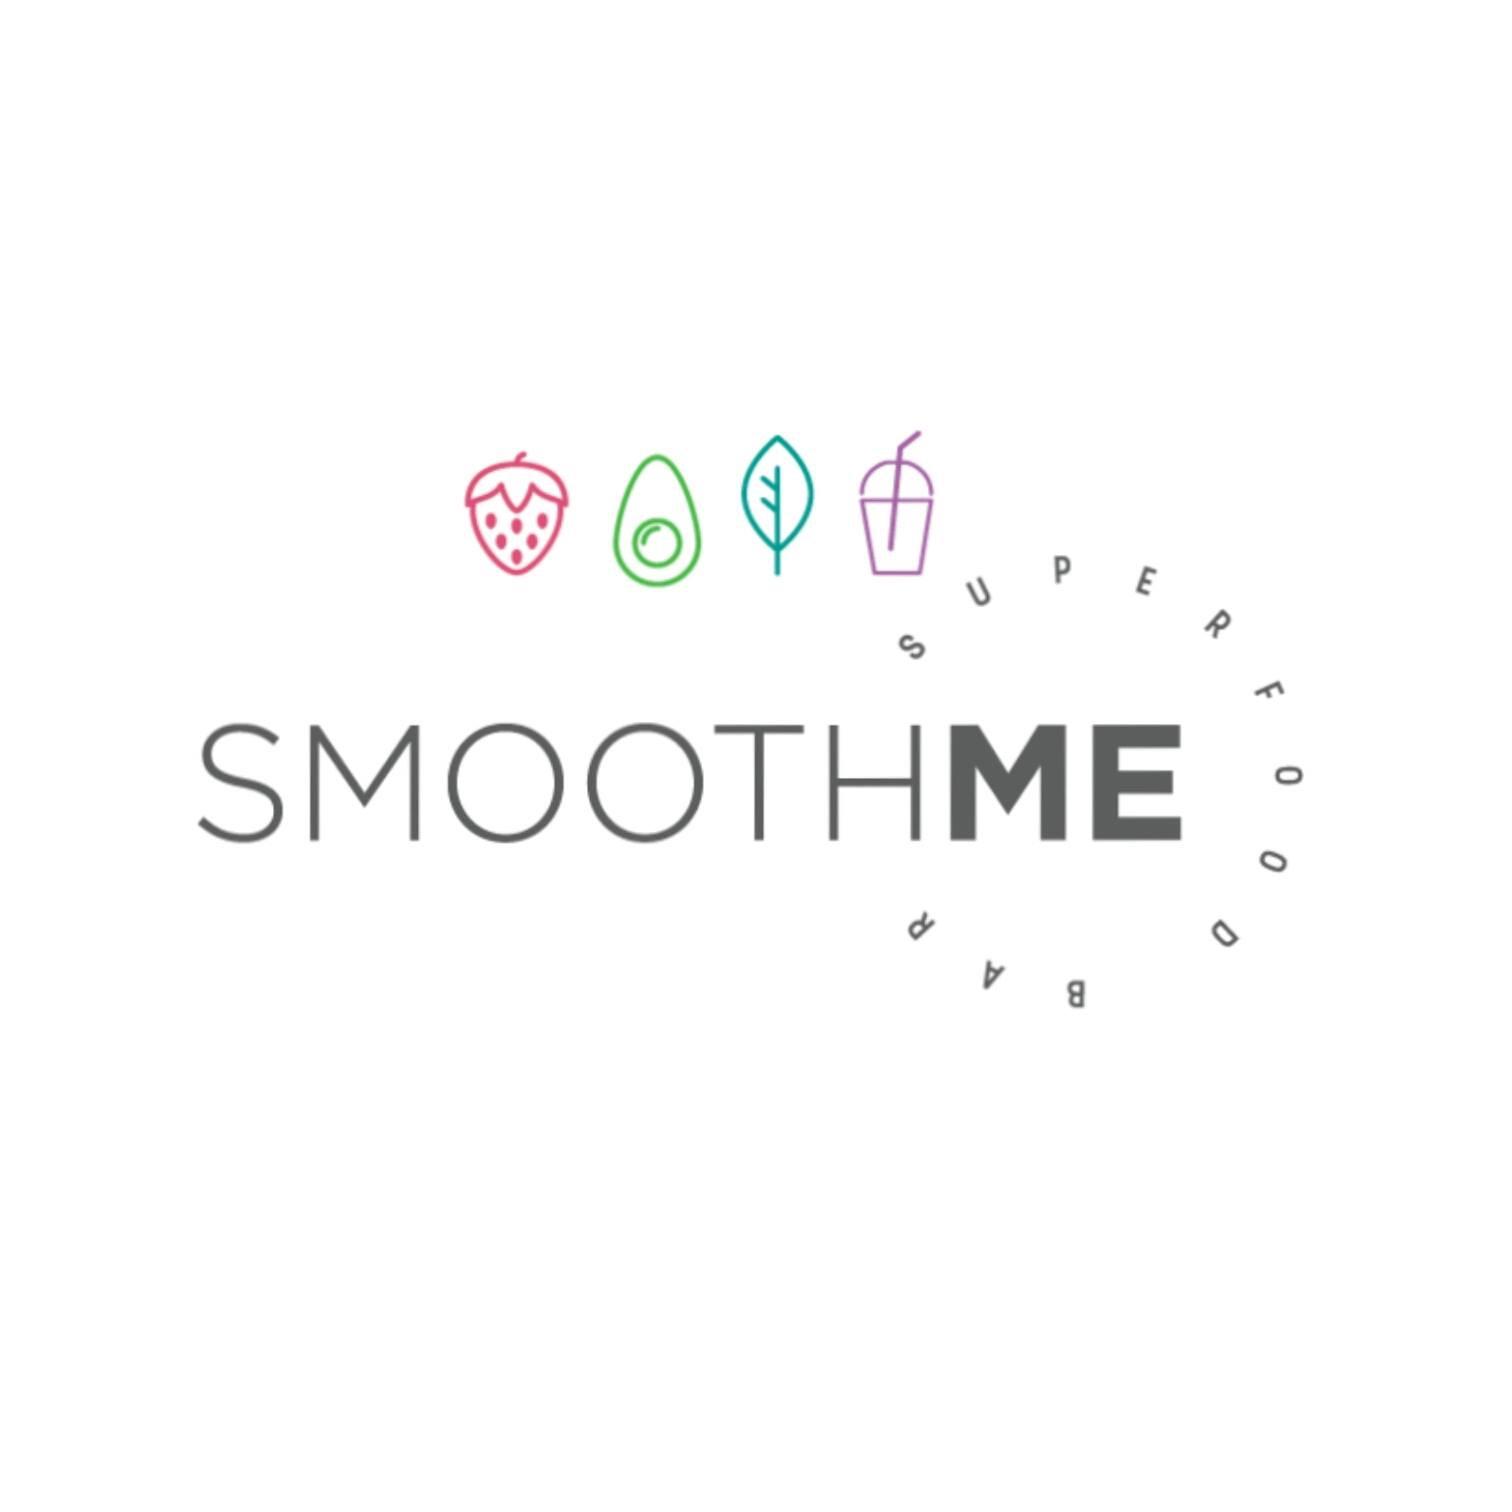 SmoothME Superfood Bar